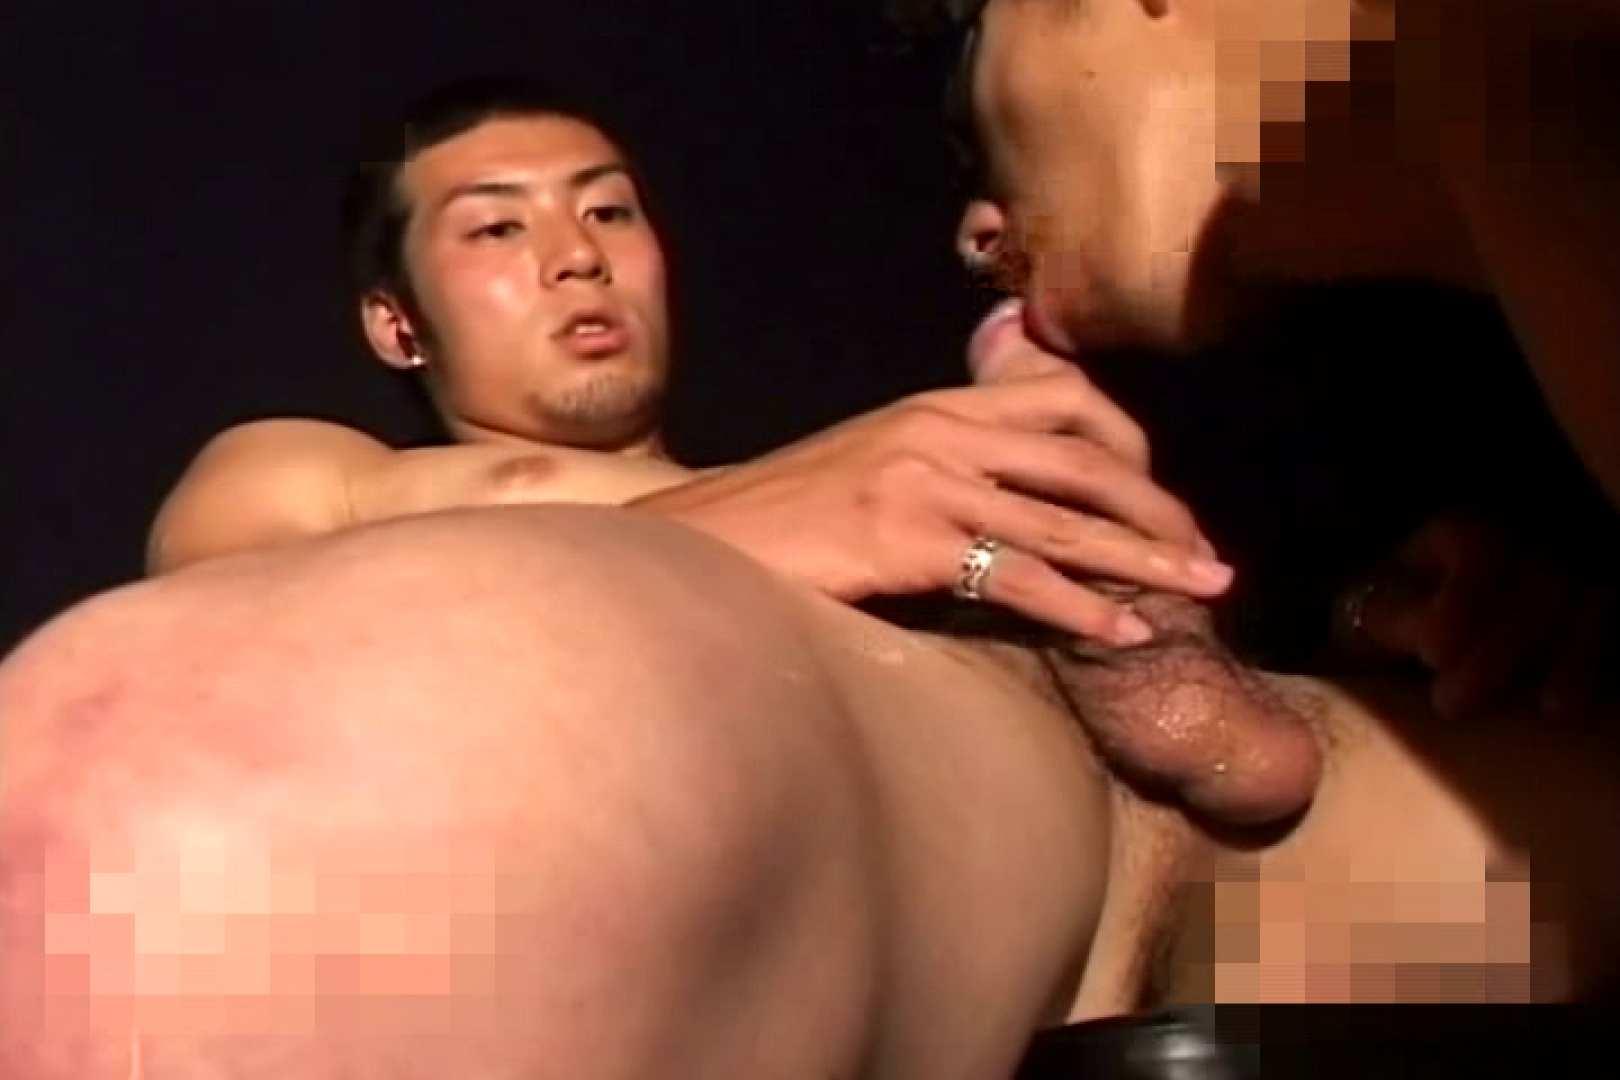 Beautiful muscle モッコリ野郎達!Vol.04 フェチ ゲイAV画像 49連発 46